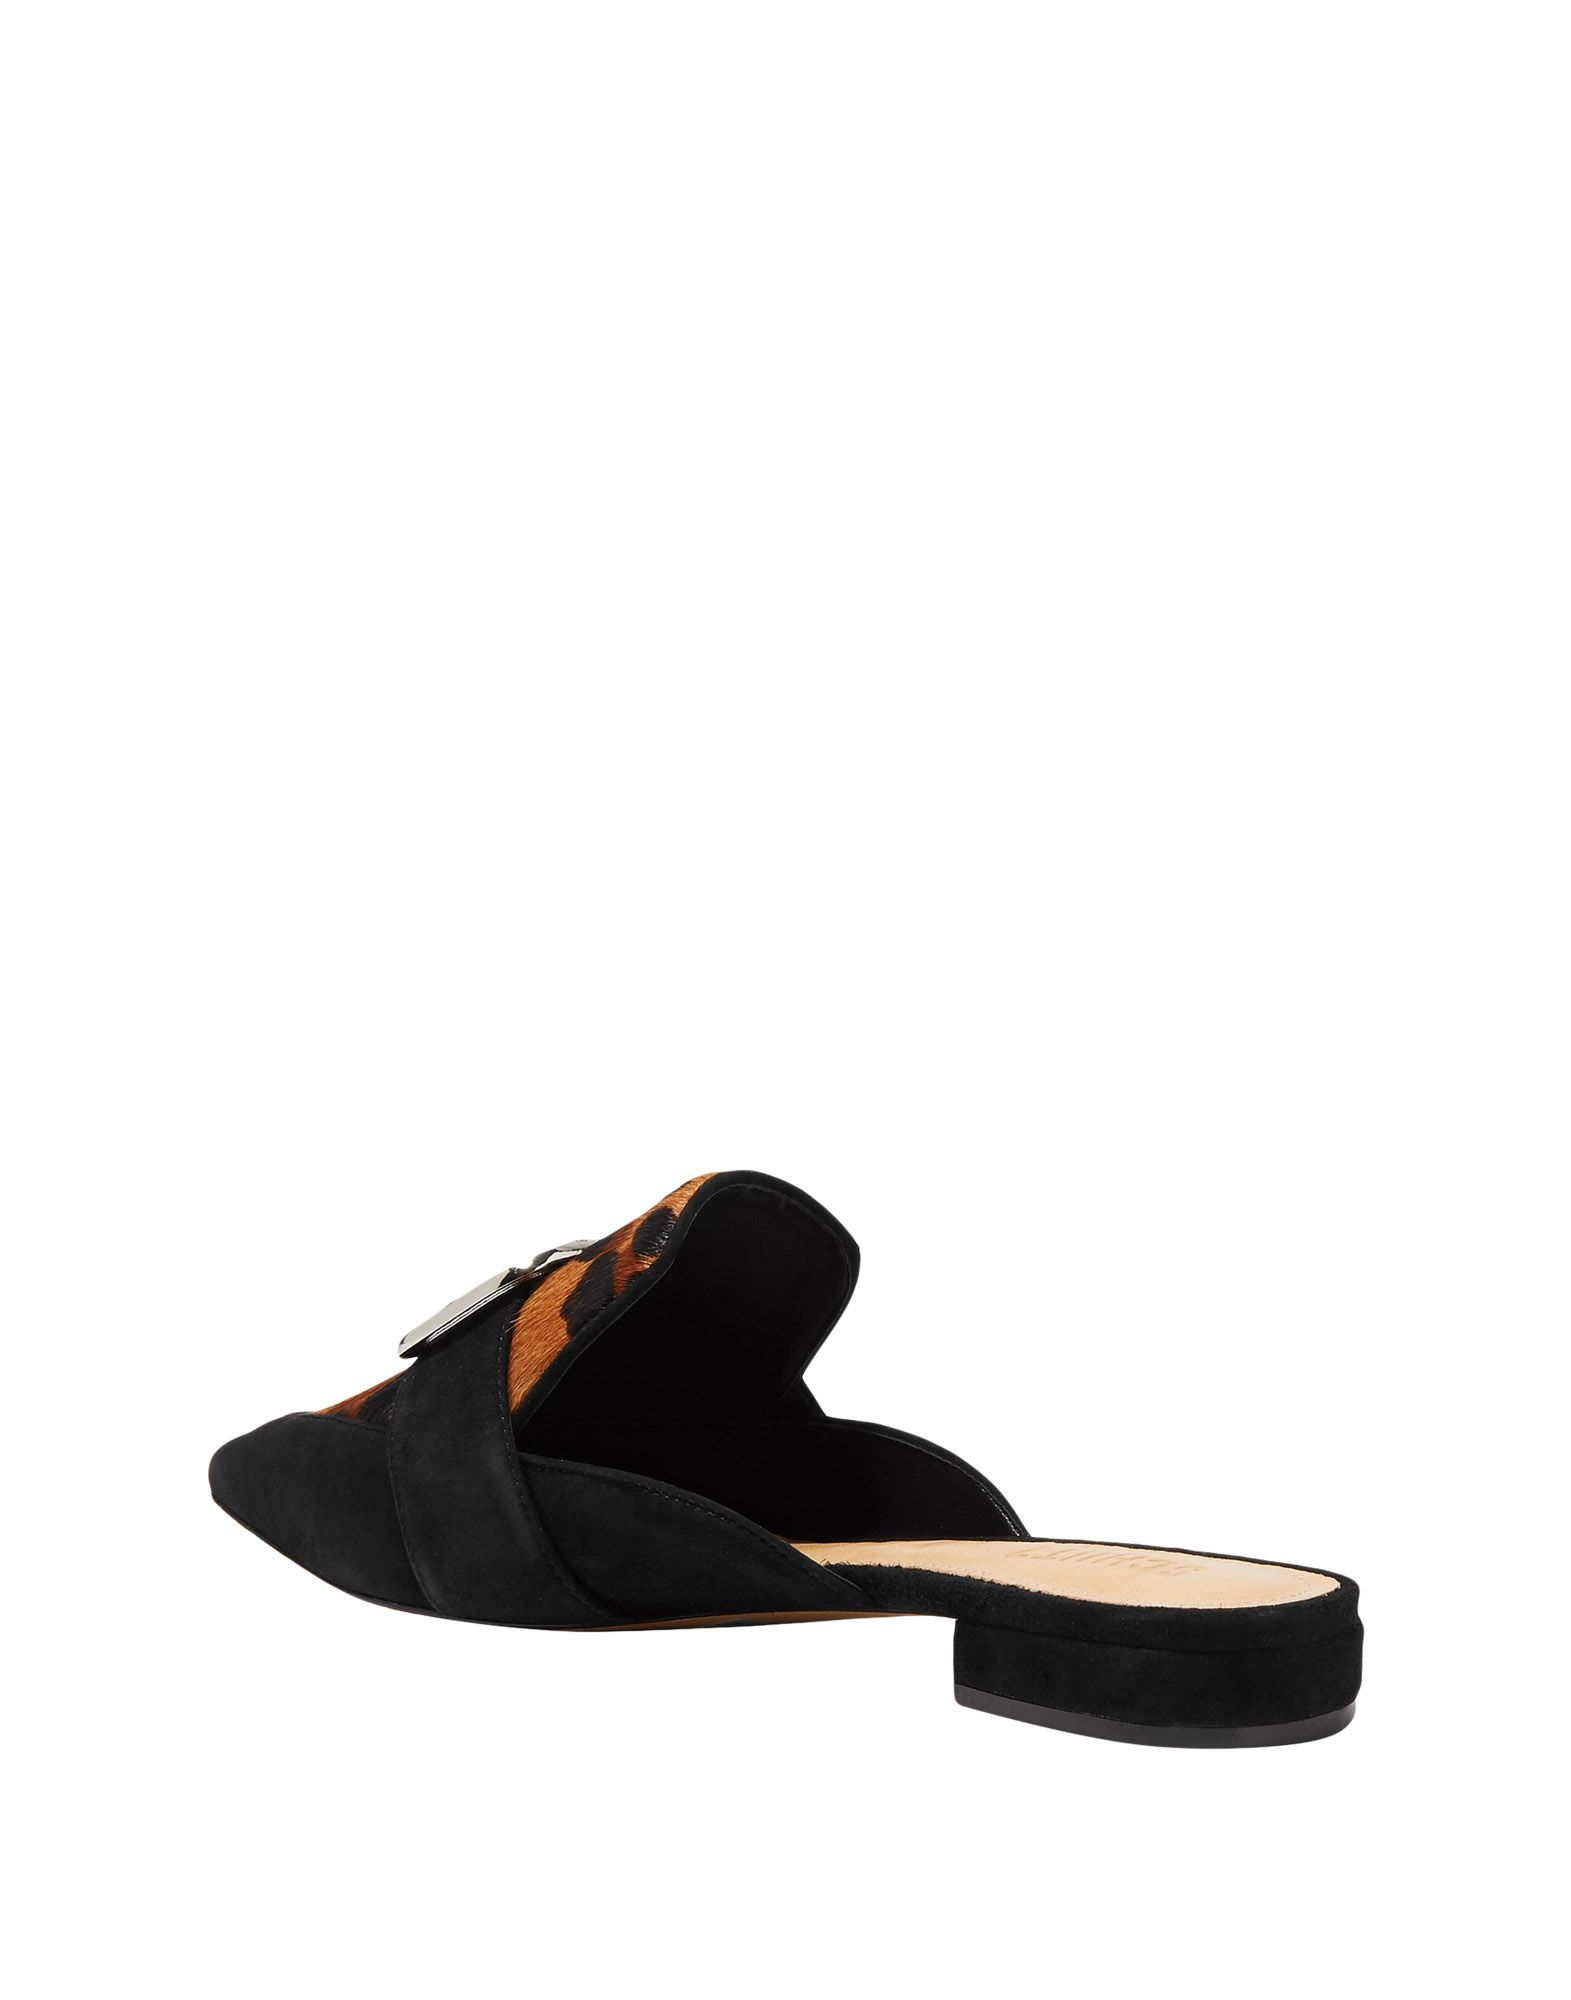 Stilvolle billige Schuhe Schutz Pantoletten Damen  11513808EO